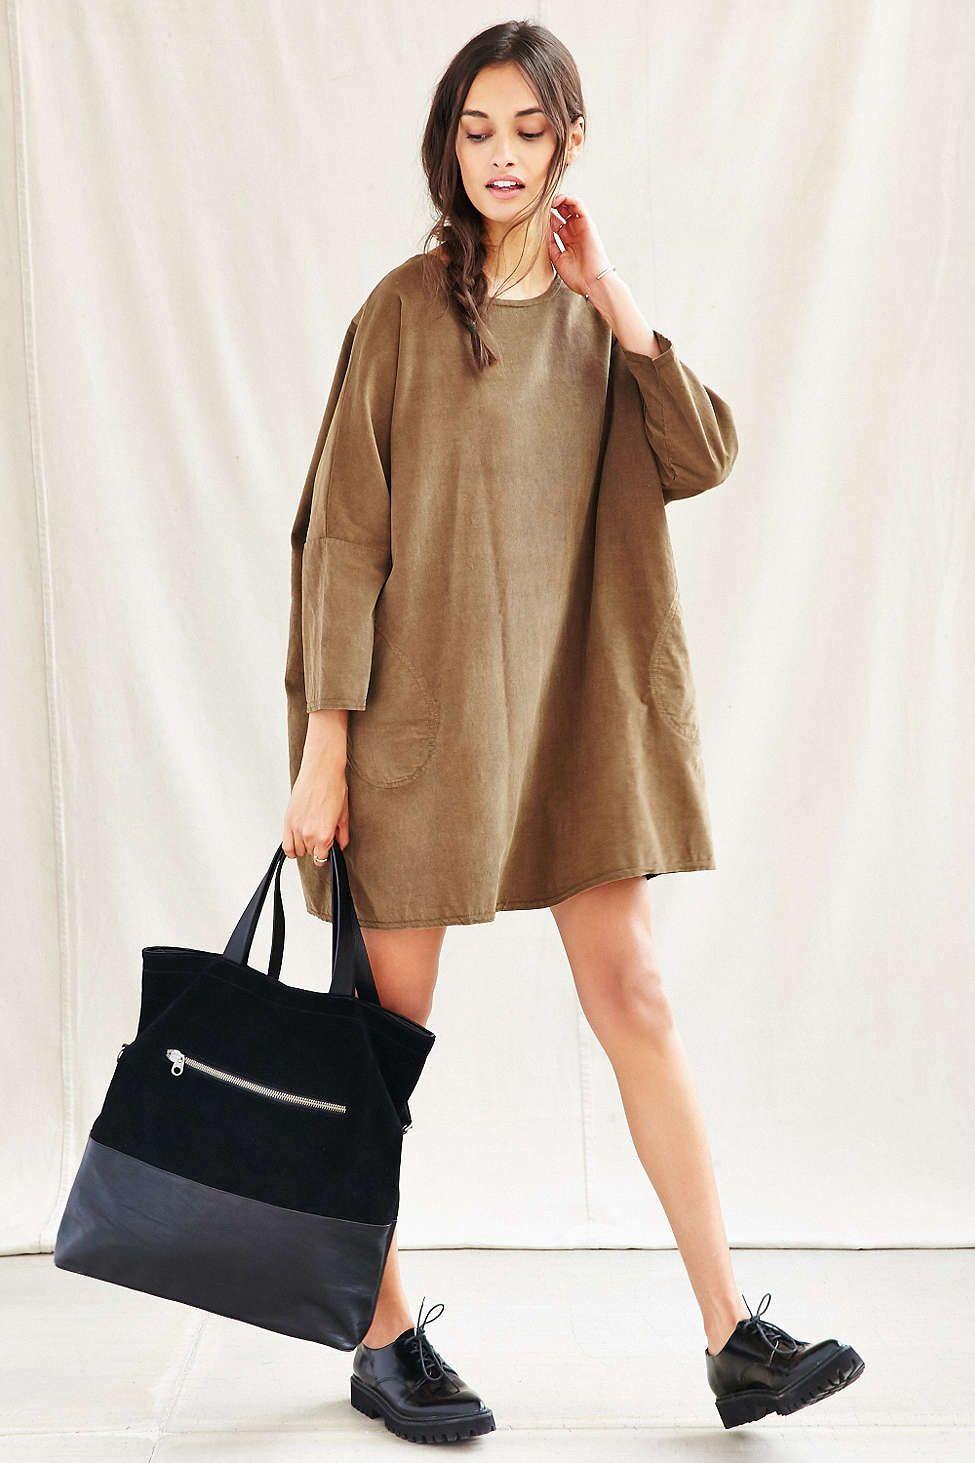 69065d8db49b Urban Renewal Remade Corduroy Sack Dress - Urban Outfitters ...